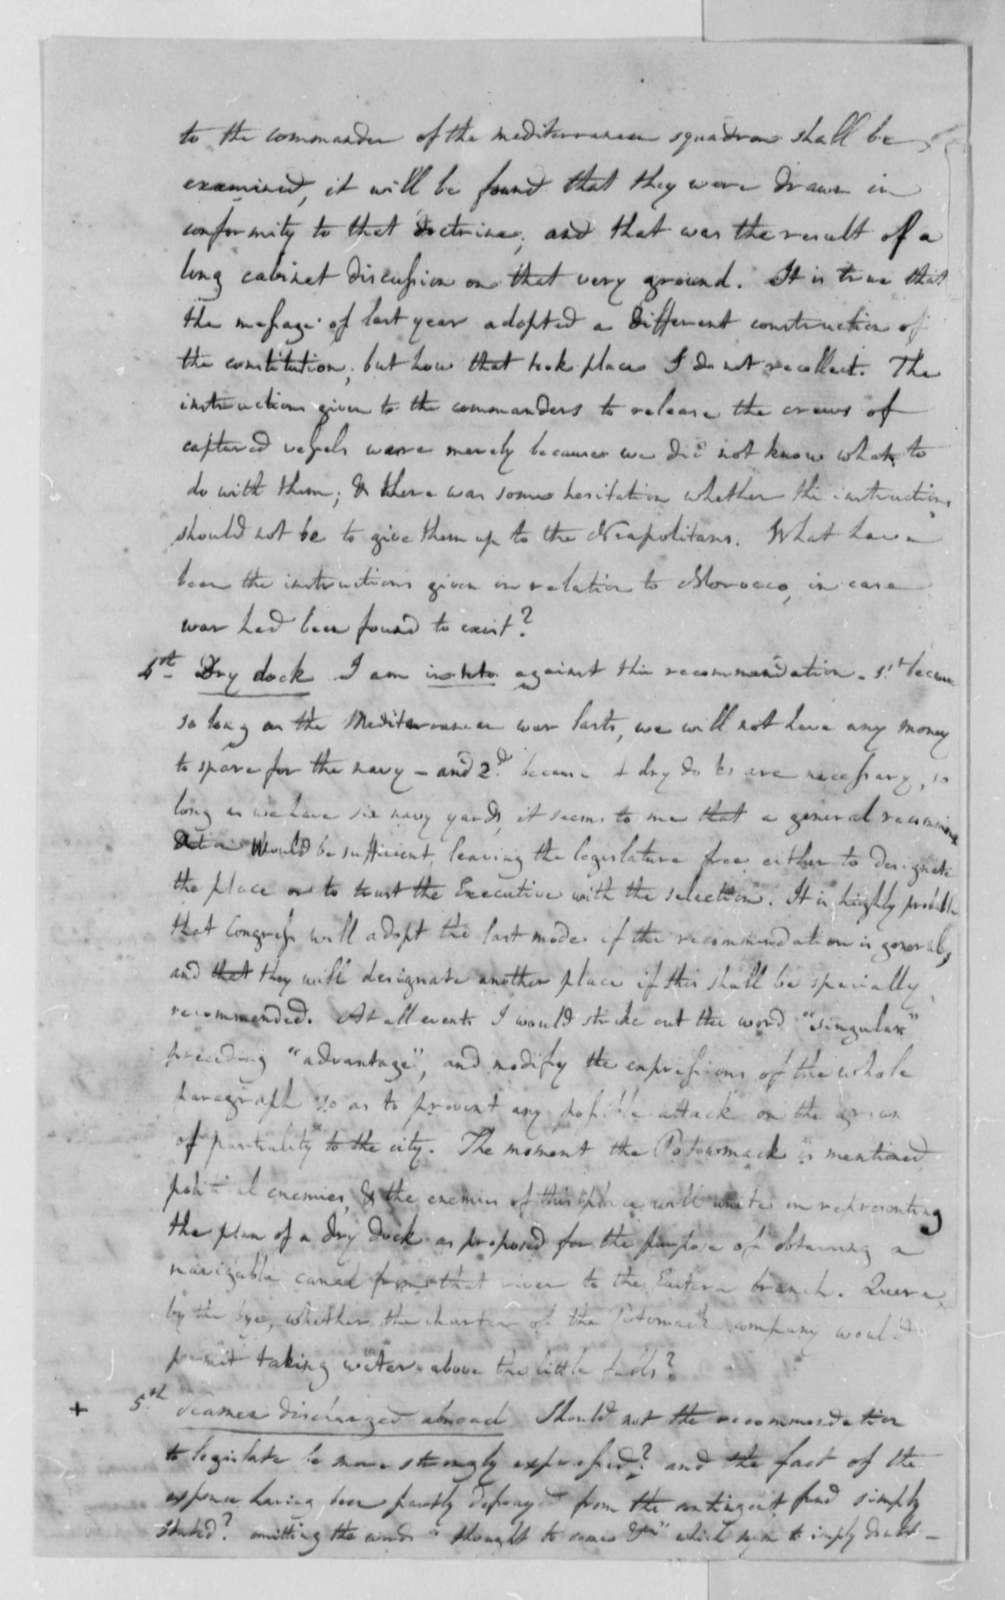 Albert Gallatin to Thomas Jefferson, November 21, 1802